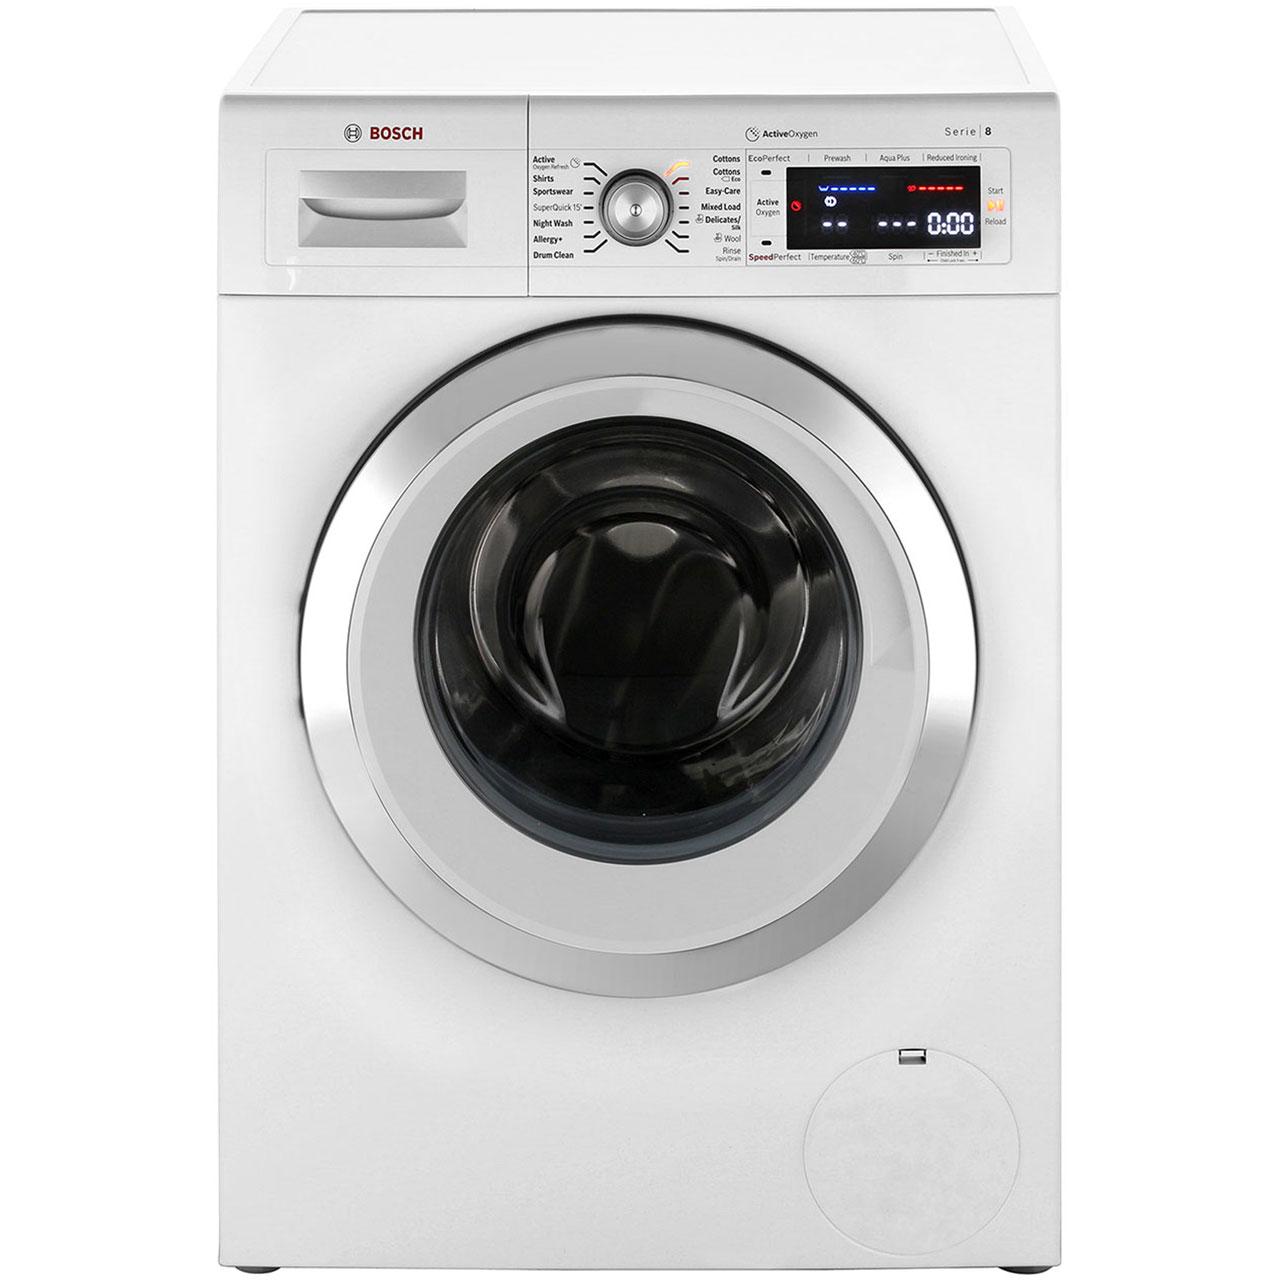 Bosch Serie 8 Waw28750gb 9kg Washing Machine With 1400 Rpm White